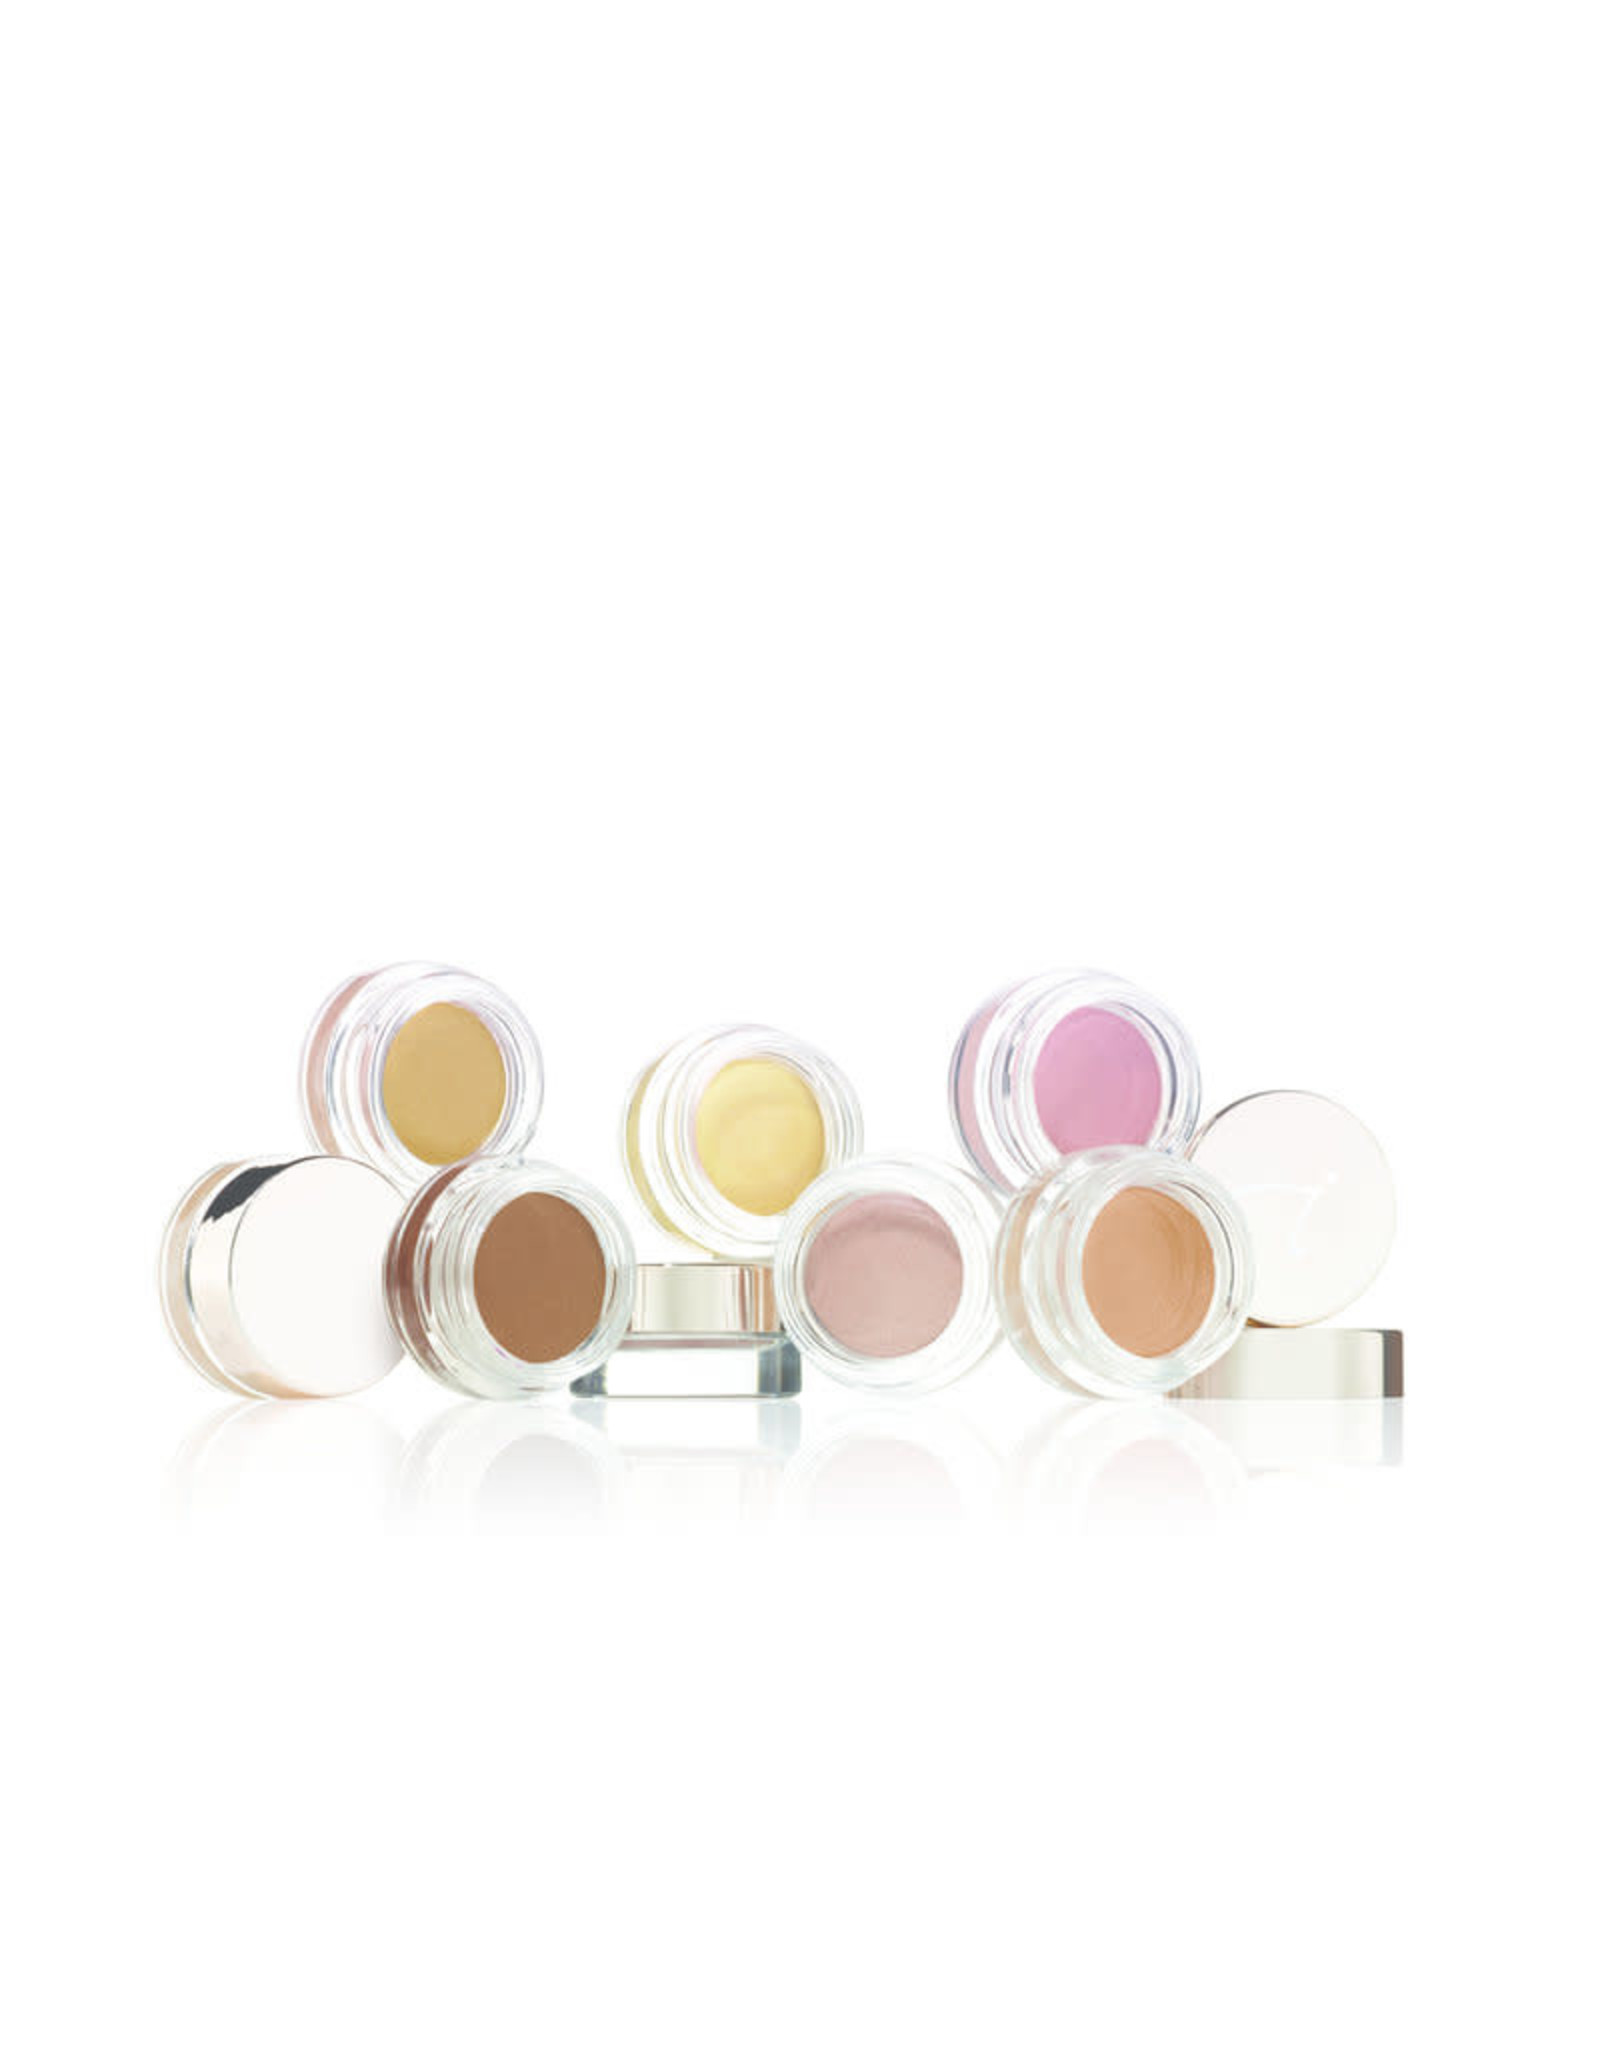 Jane Iredale Smooth Affair® for Eyes Eye Shadow/Primer